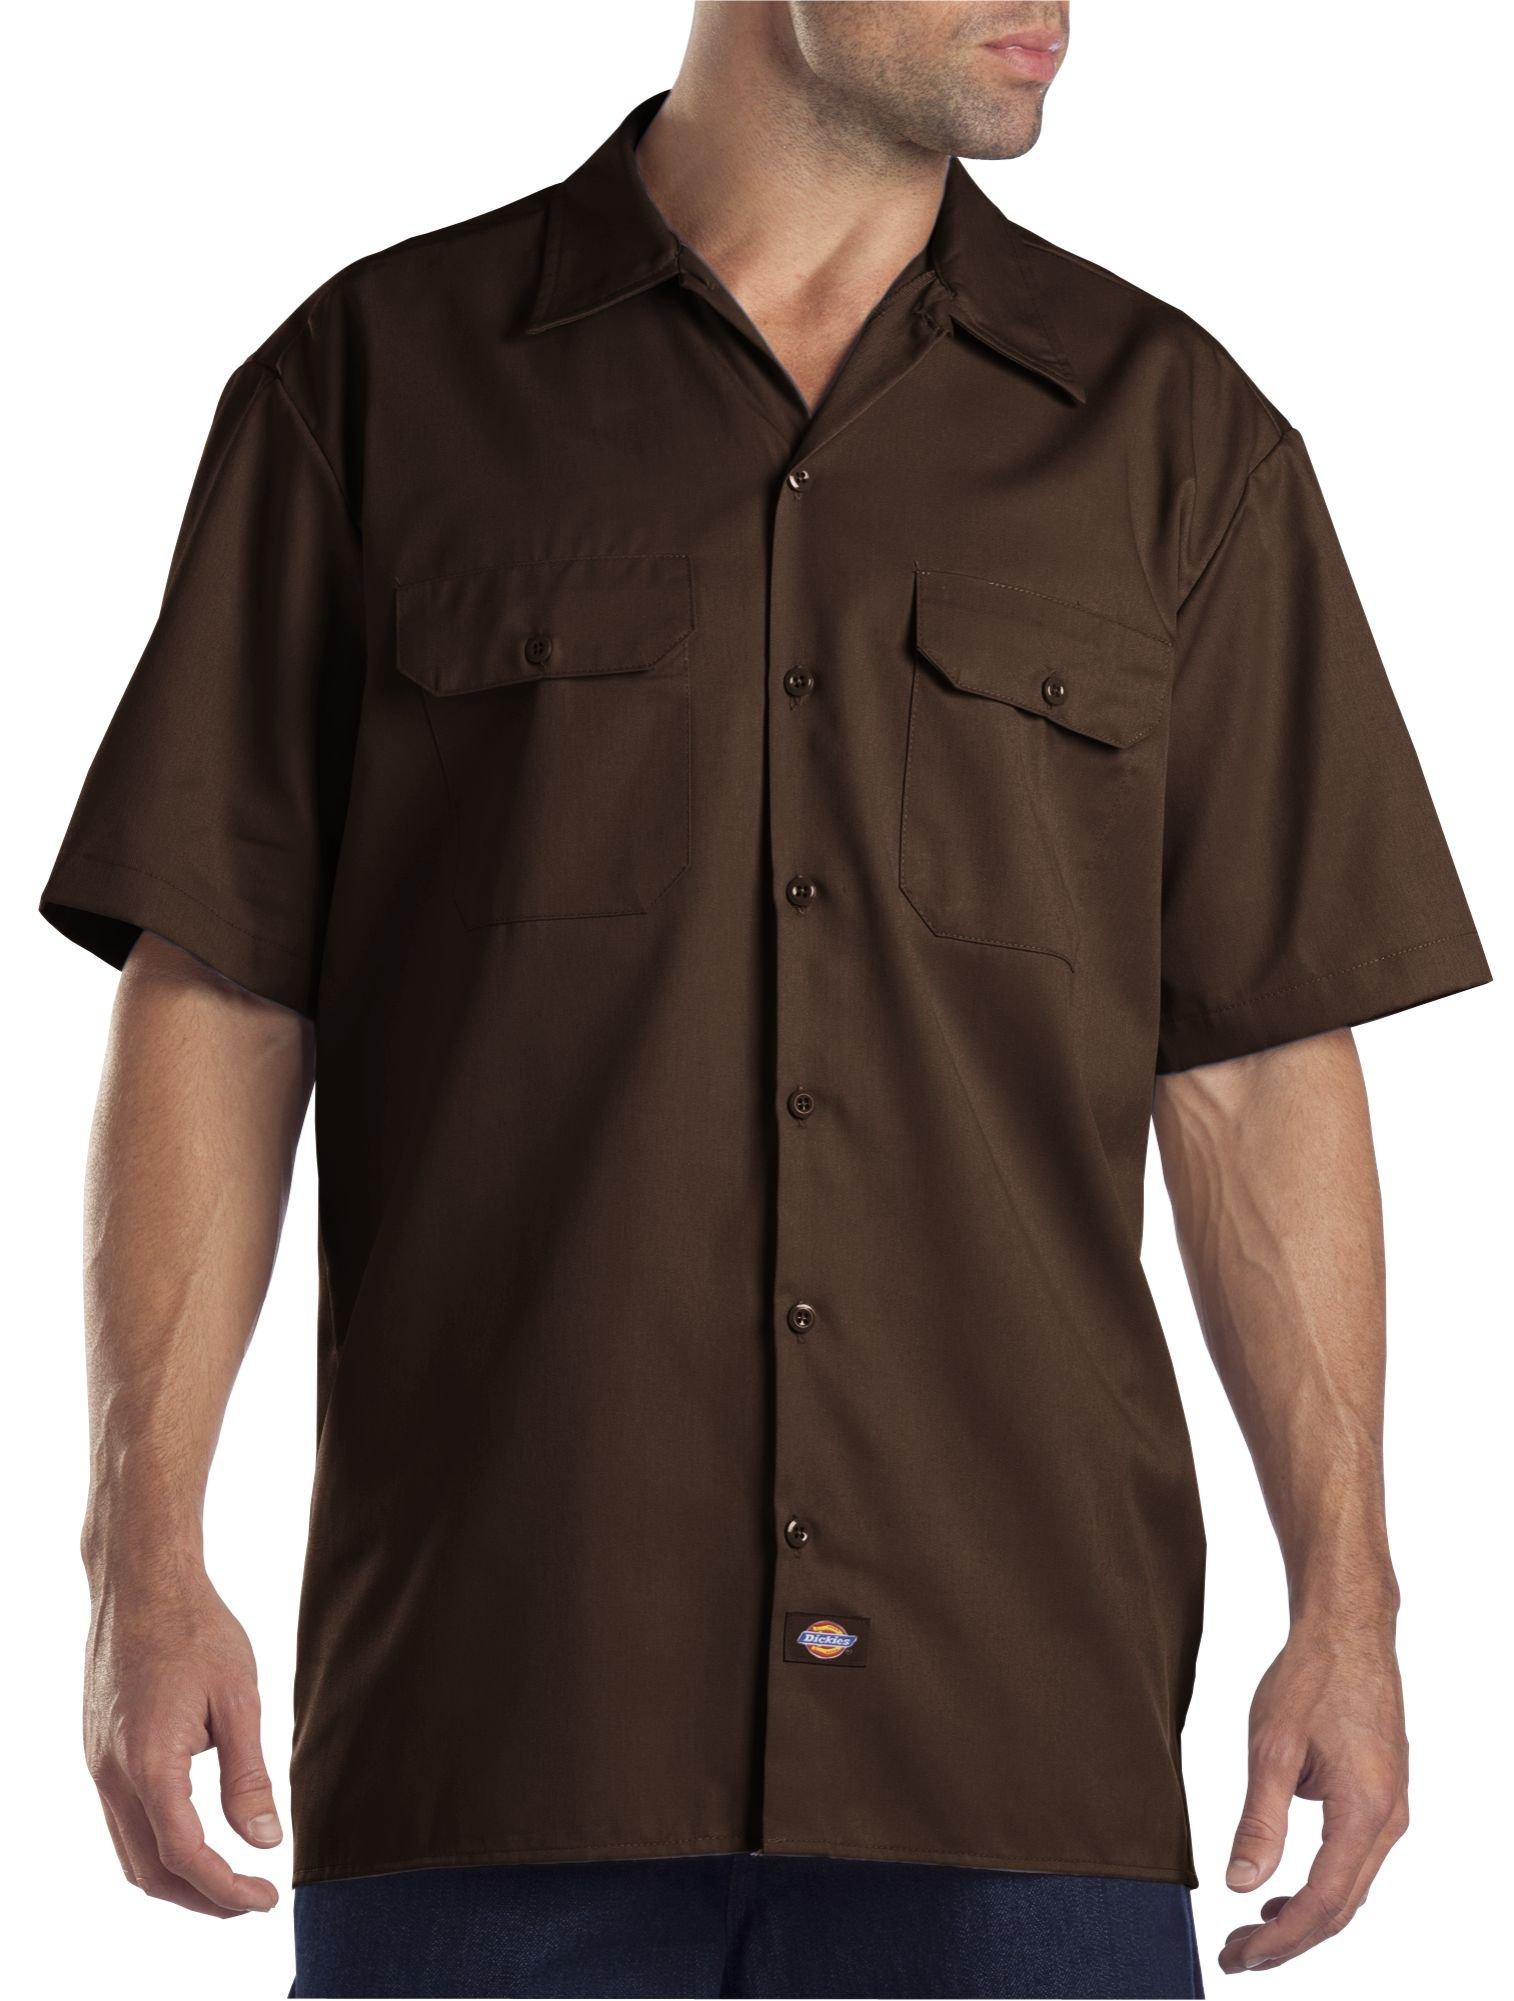 Dickies Men's Big and Tall Short Sleeve Work Shirt, Dark Brown, Extra Large